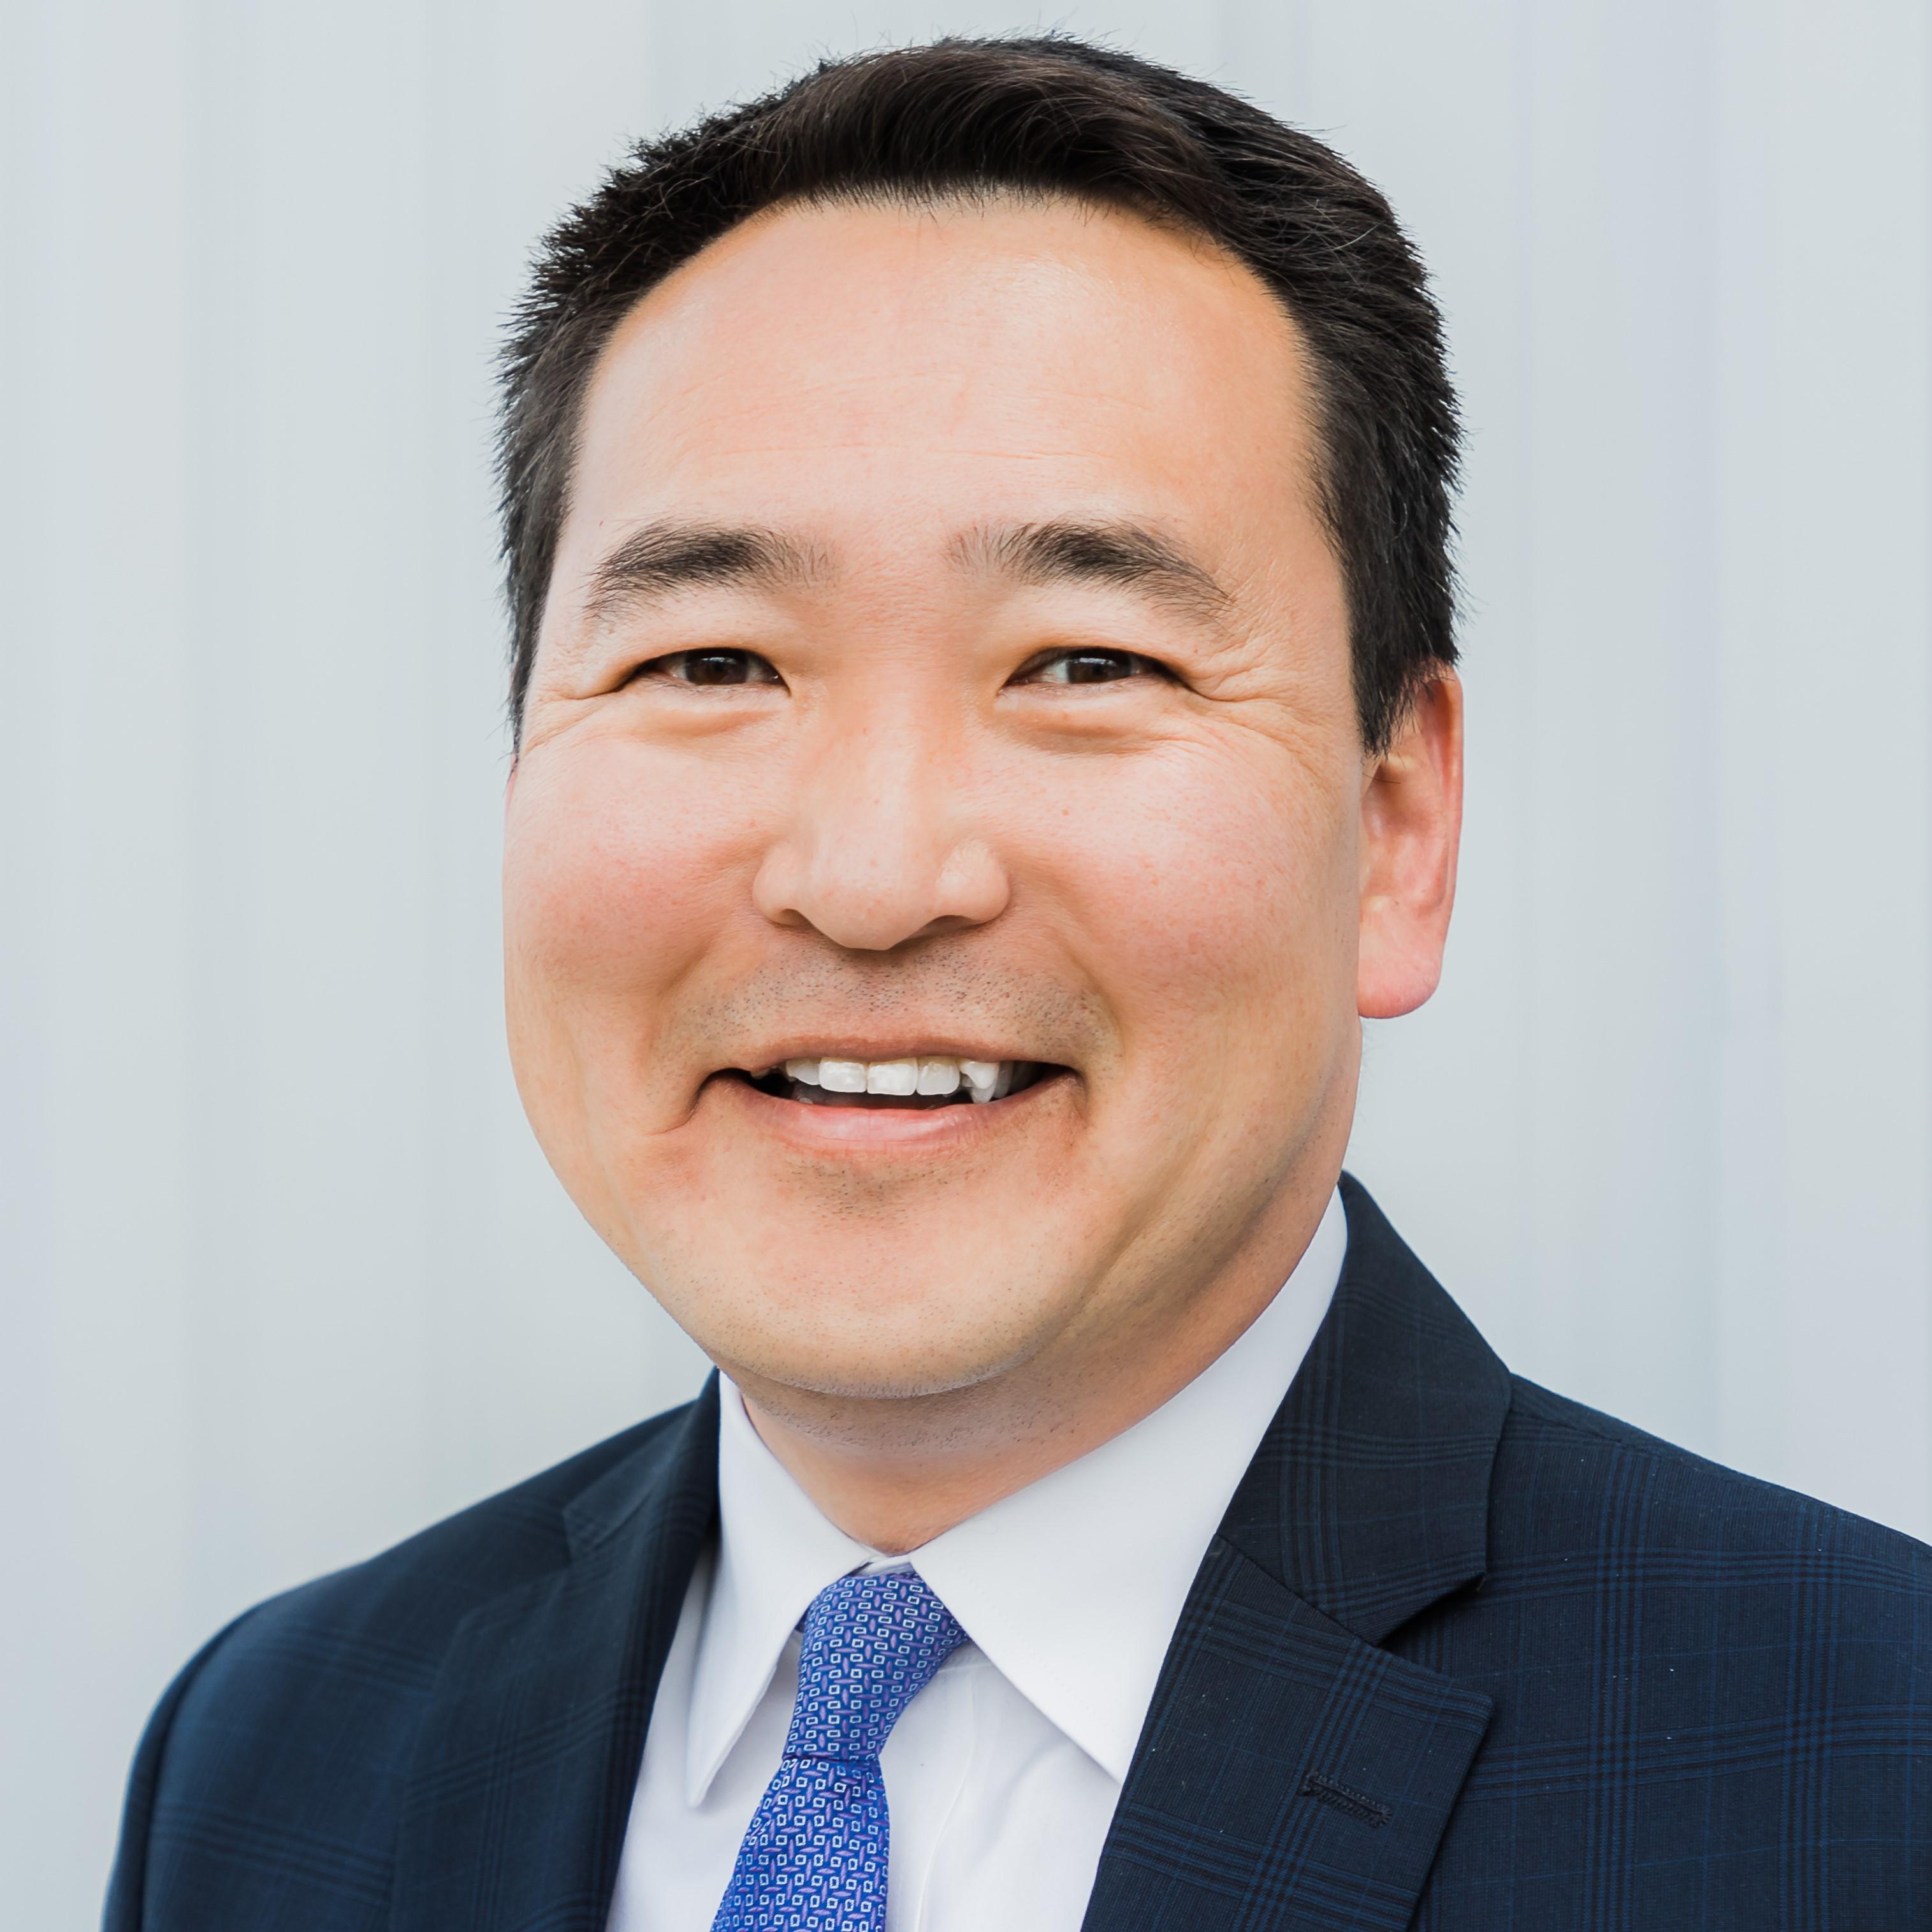 Andrew Matsuda